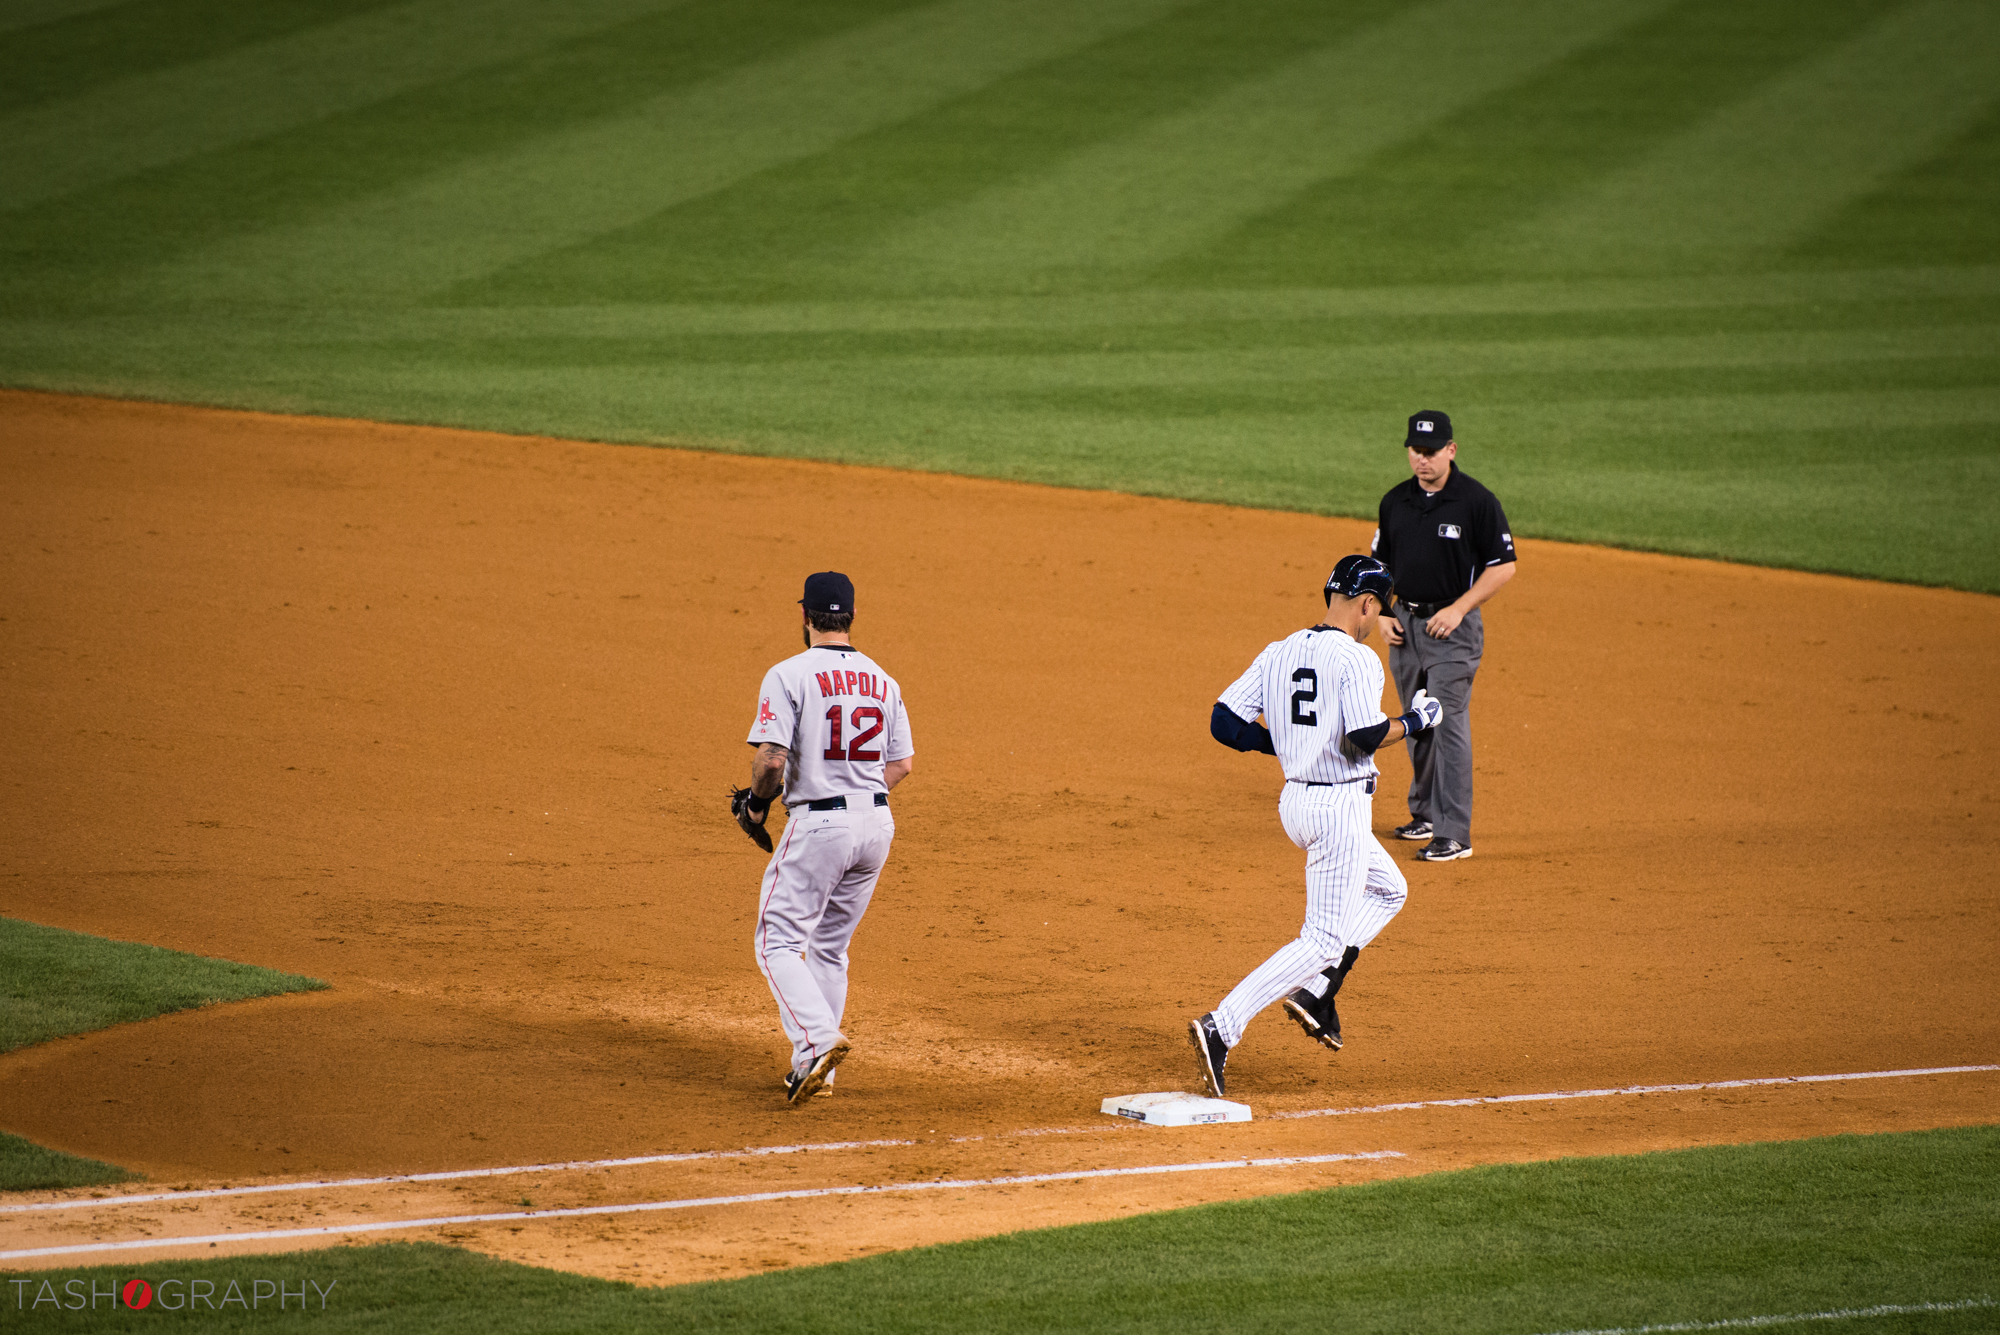 Yankees-090314-38.jpg